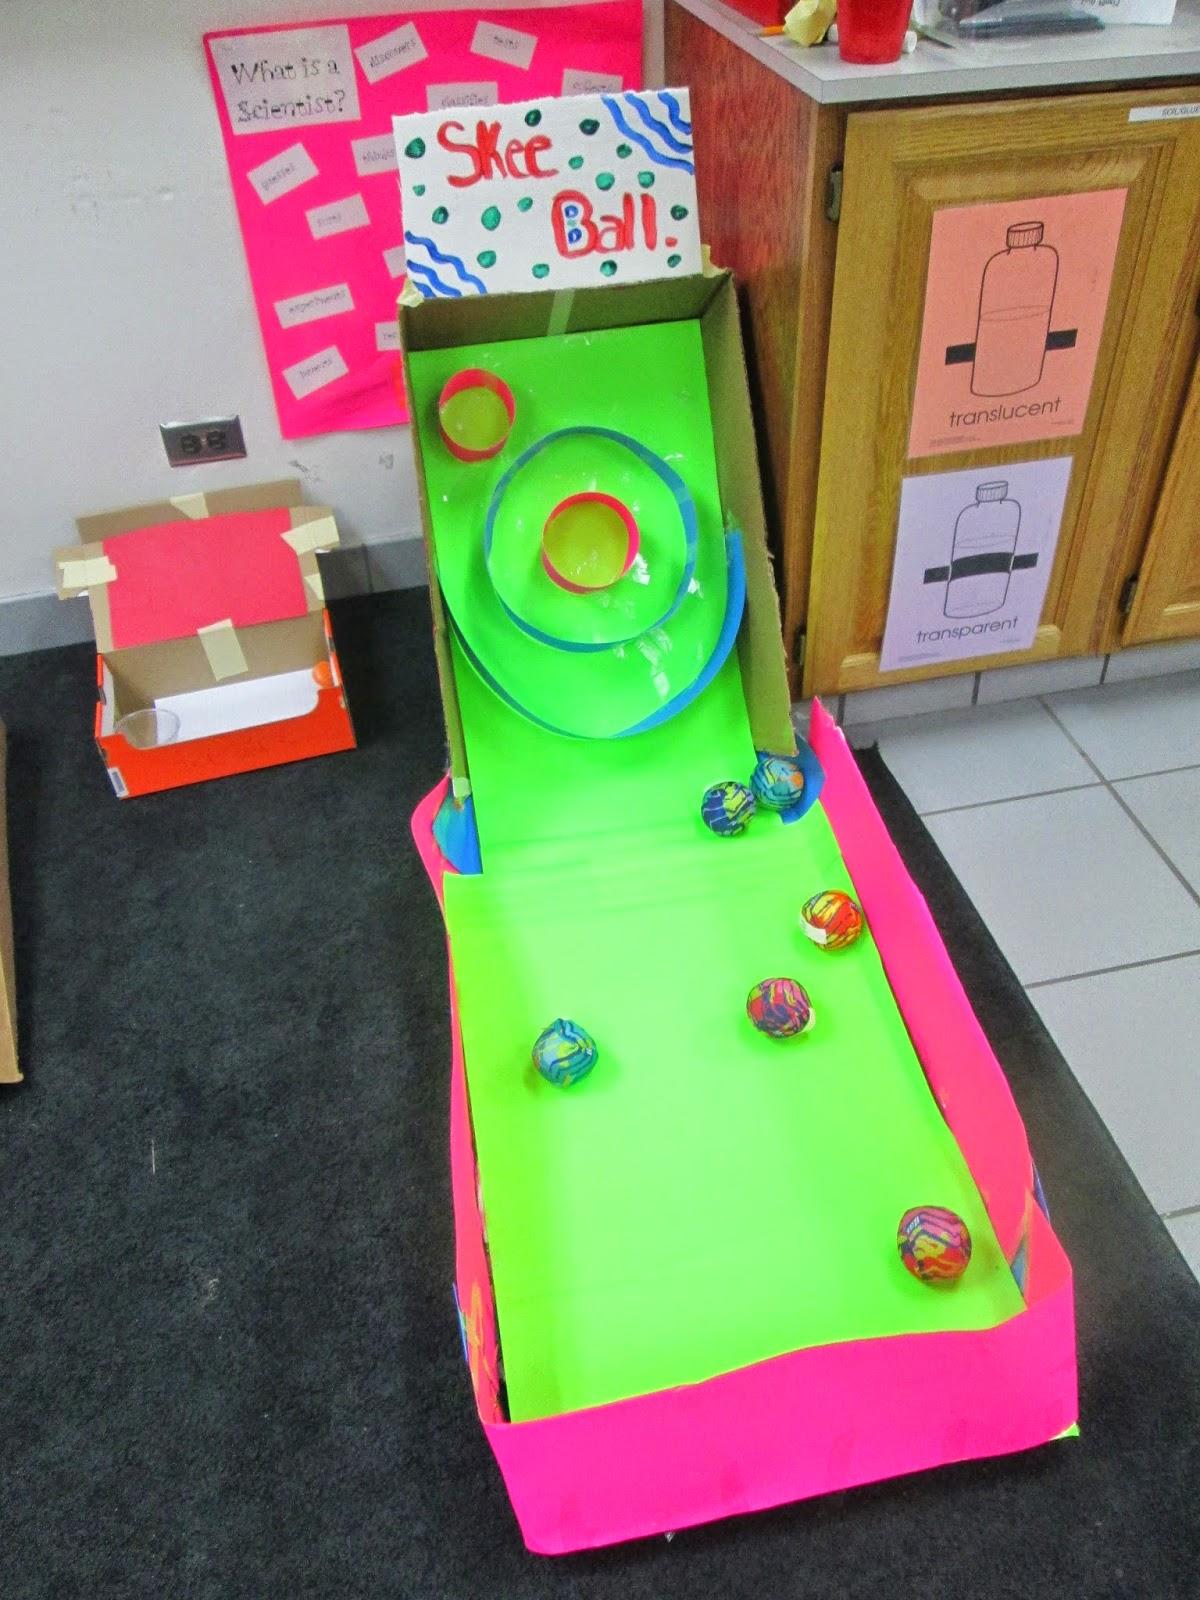 Cardboard Arcade Fun And Games The Science School Yard